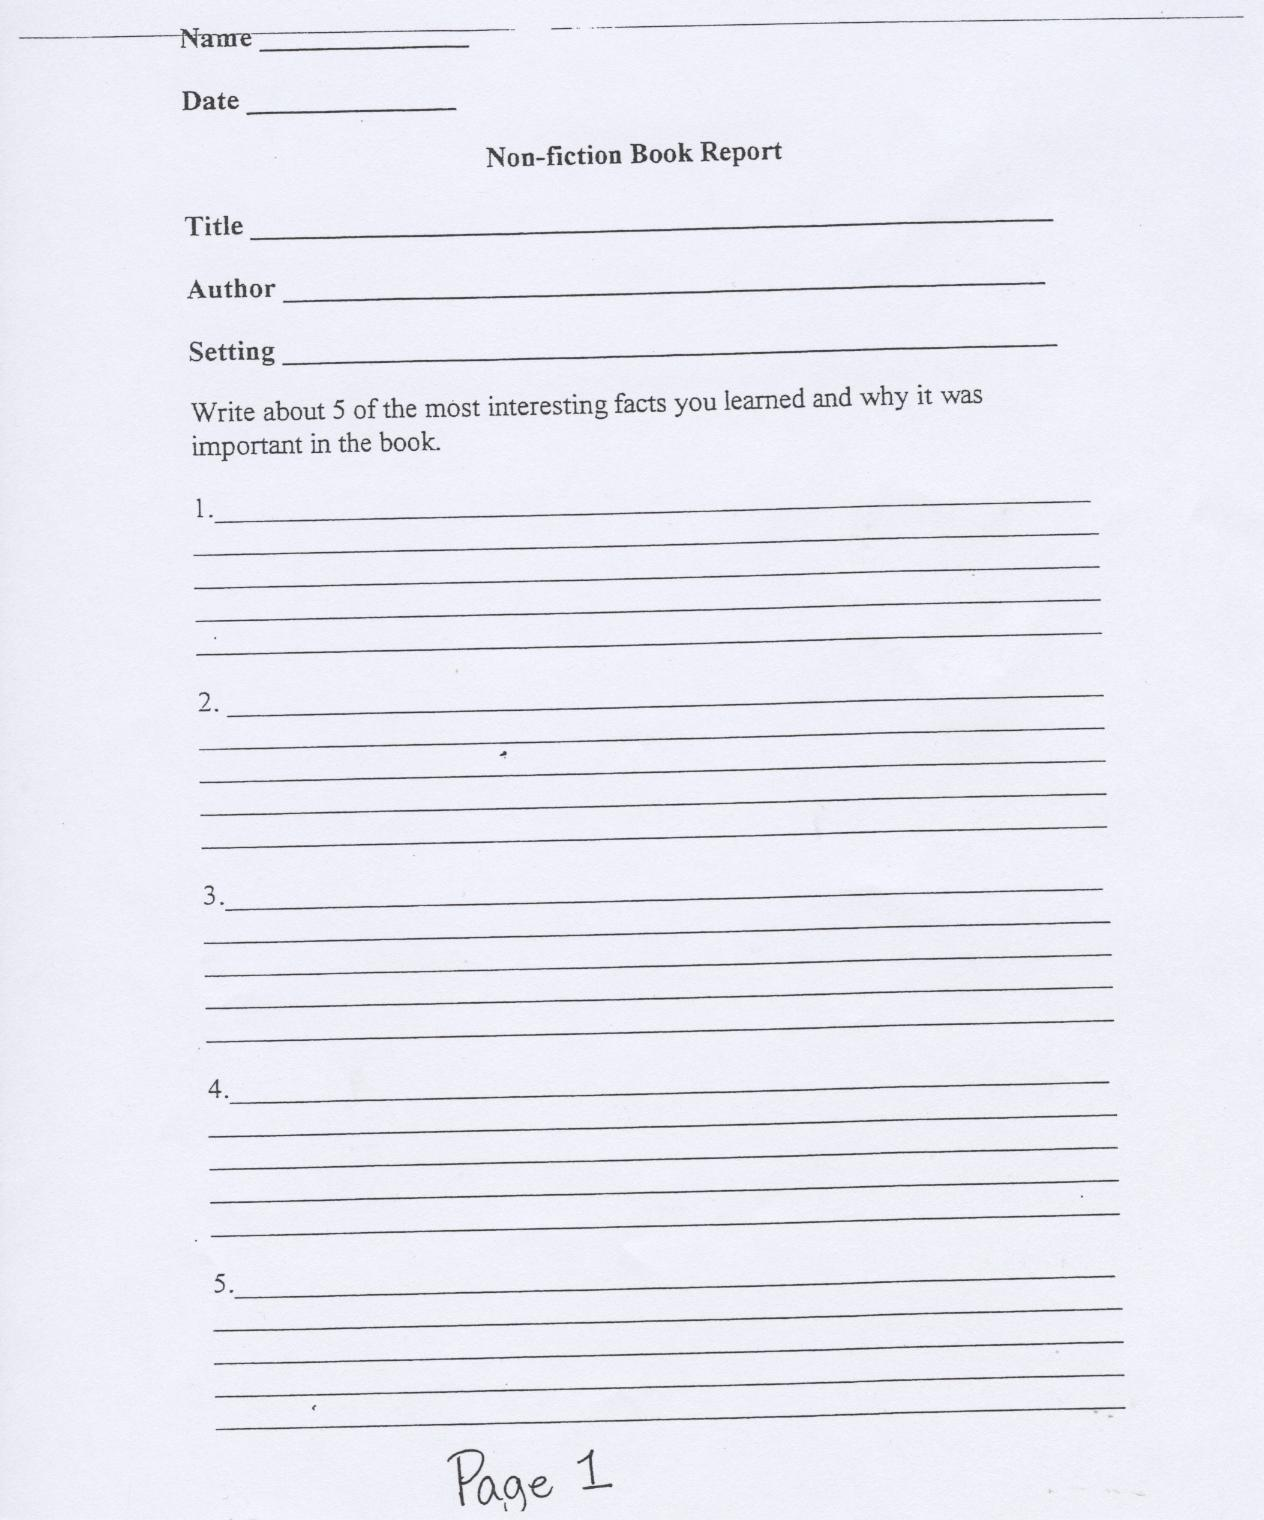 Non Fiction Book Report Form For Second Grade